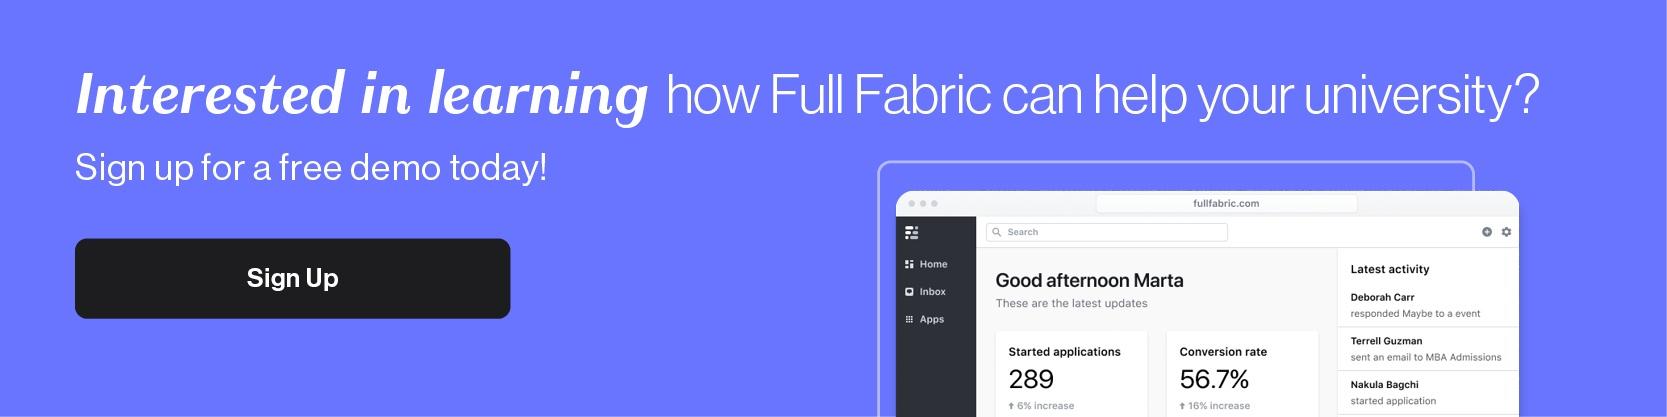 Full Fabric Demo